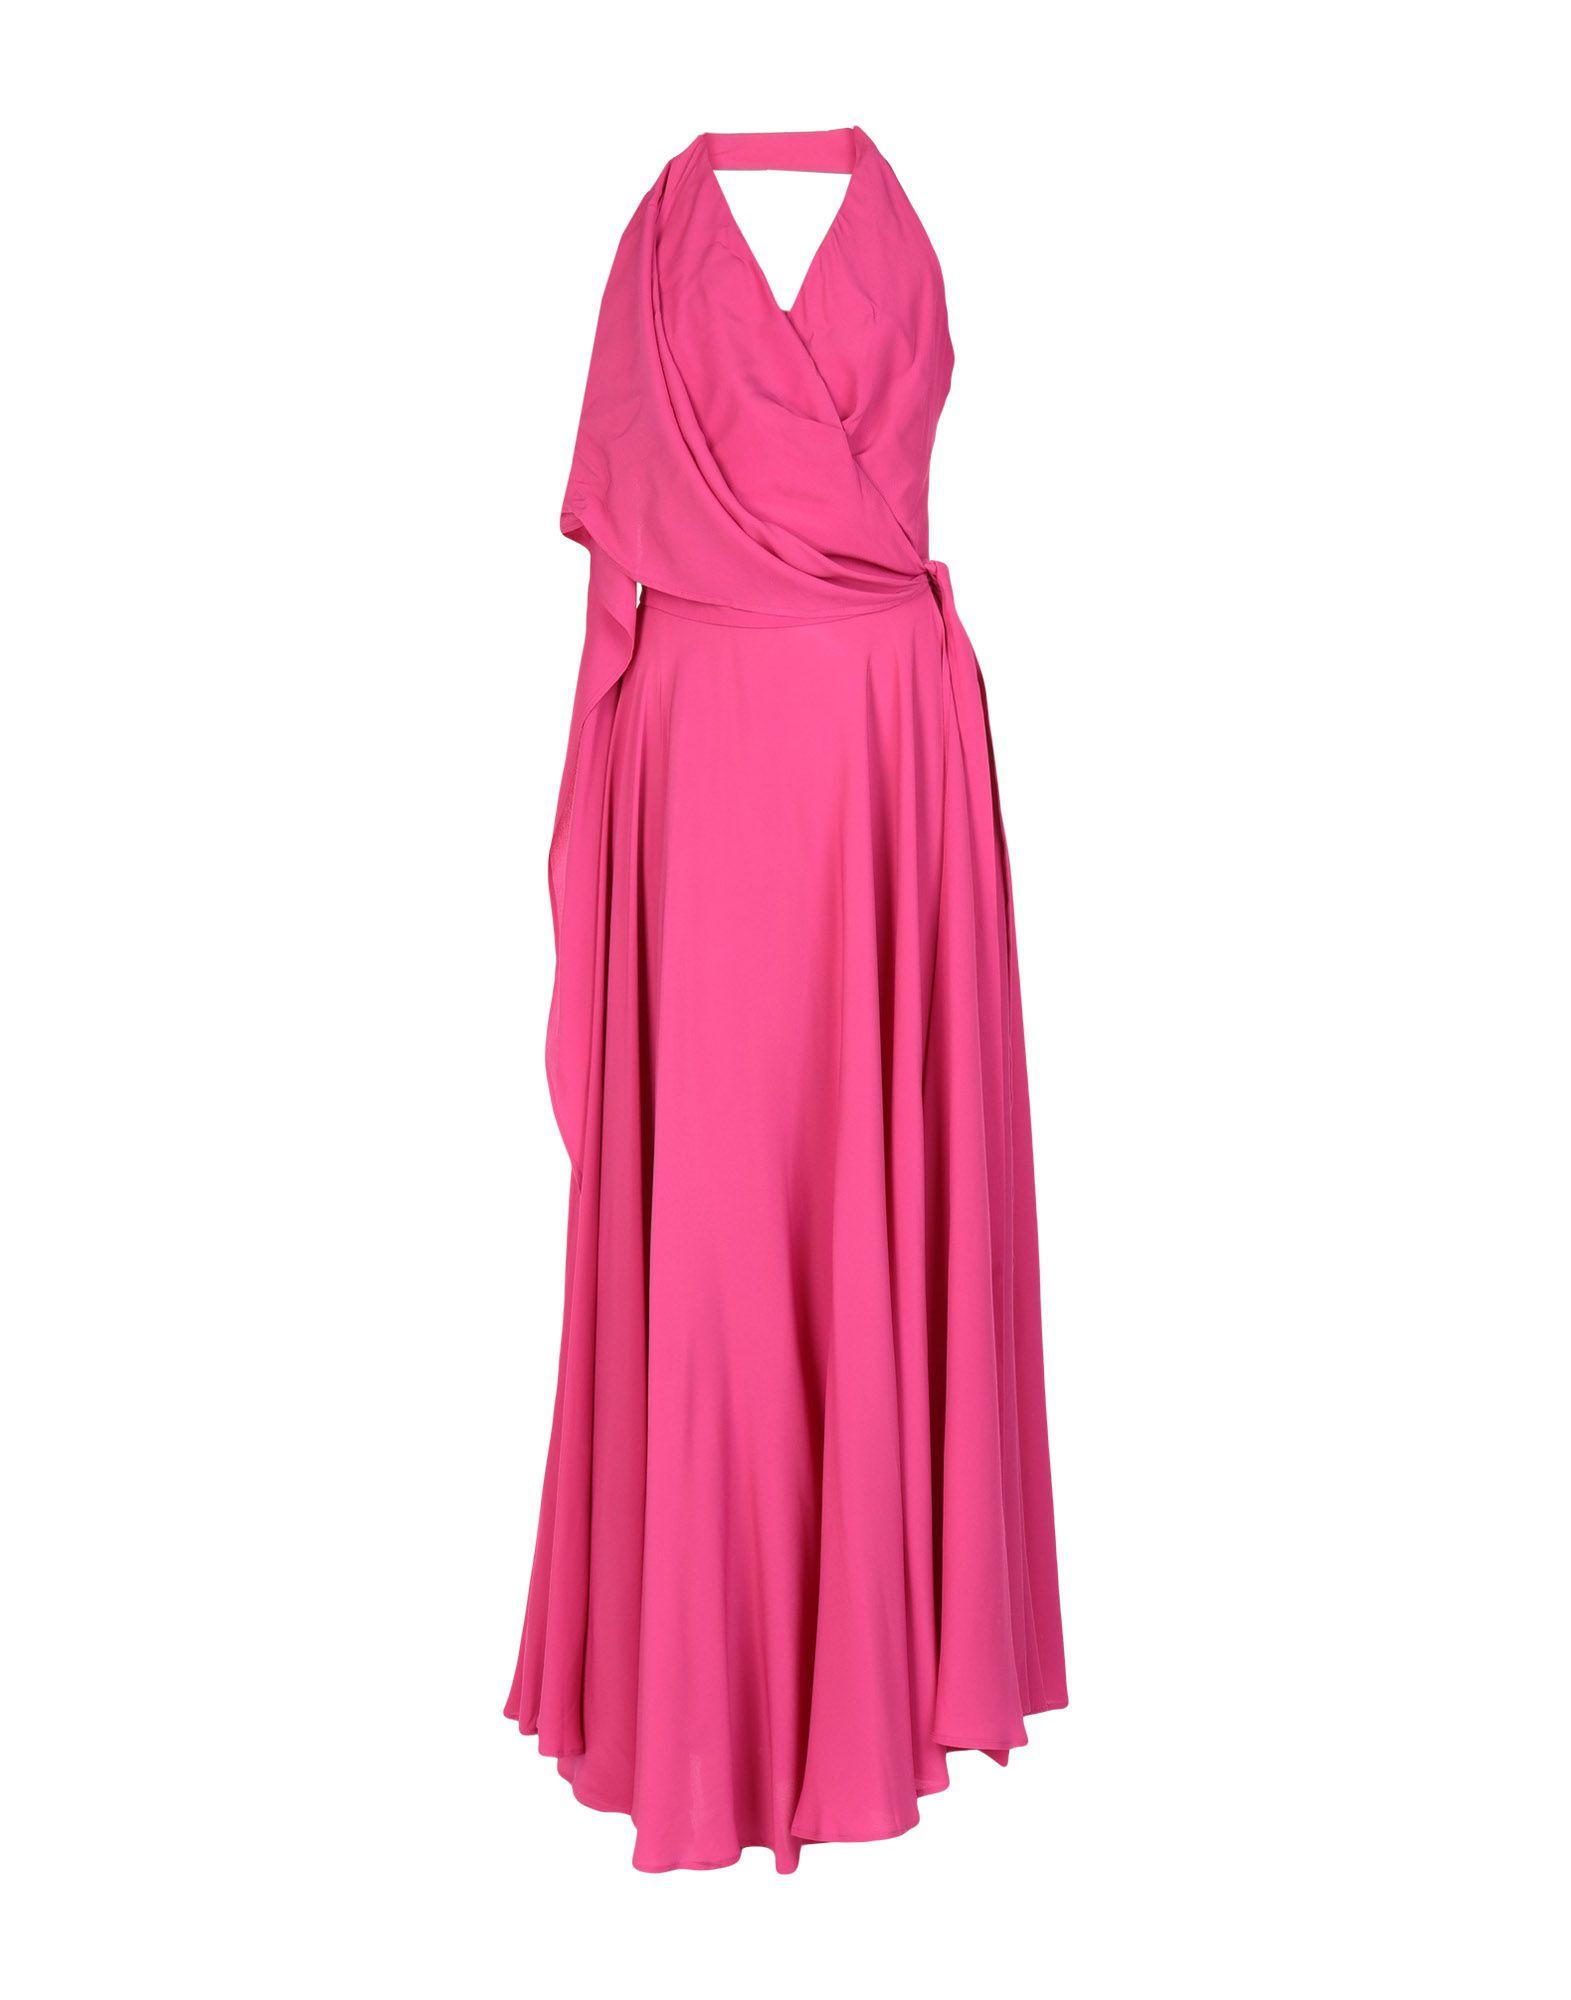 Фото - VIVIENNE WESTWOOD RED LABEL Длинное платье vivienne westwood red label длинное платье